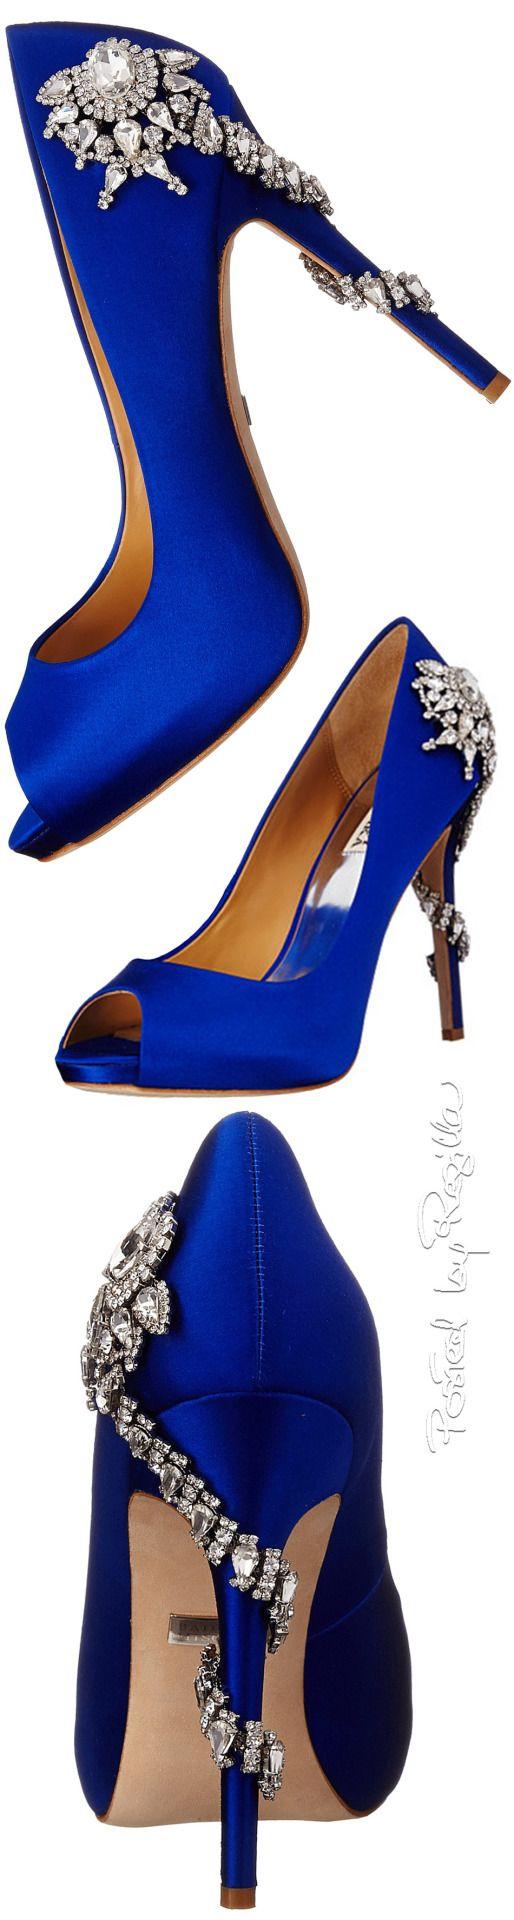 Regilla badgley mischka royal blue pinterest badgley